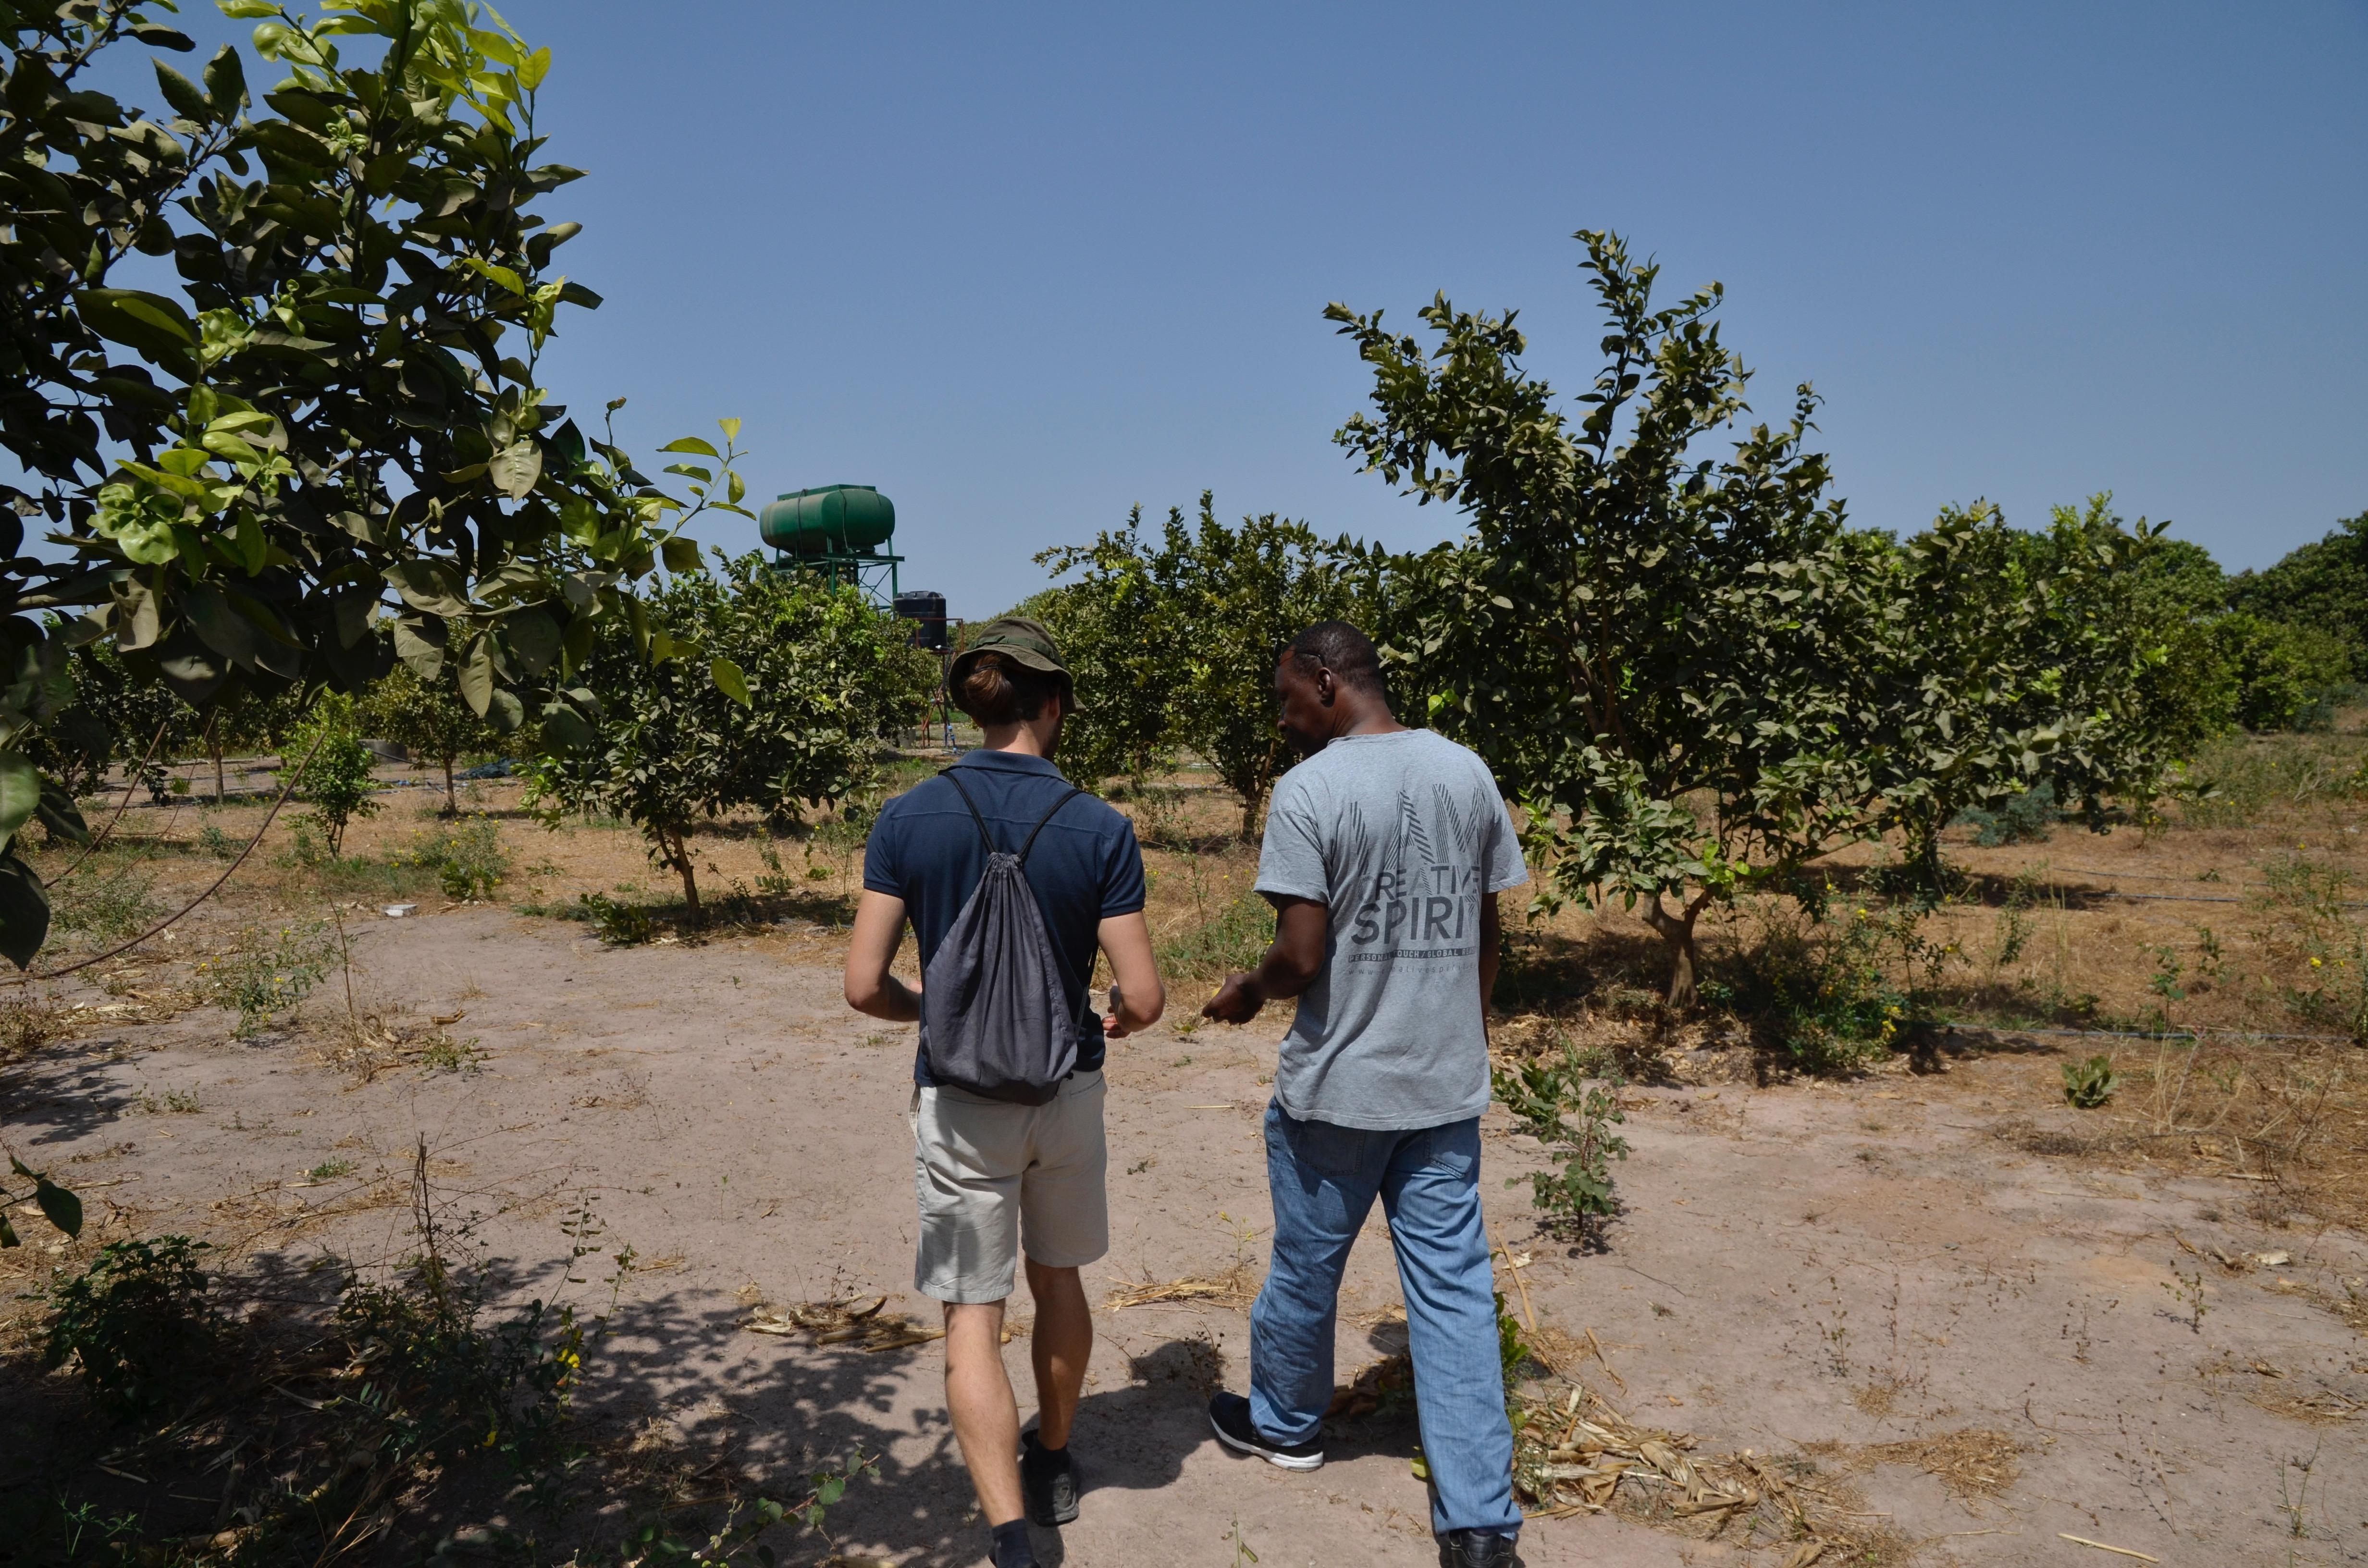 Visiting the 'Greenfarm'